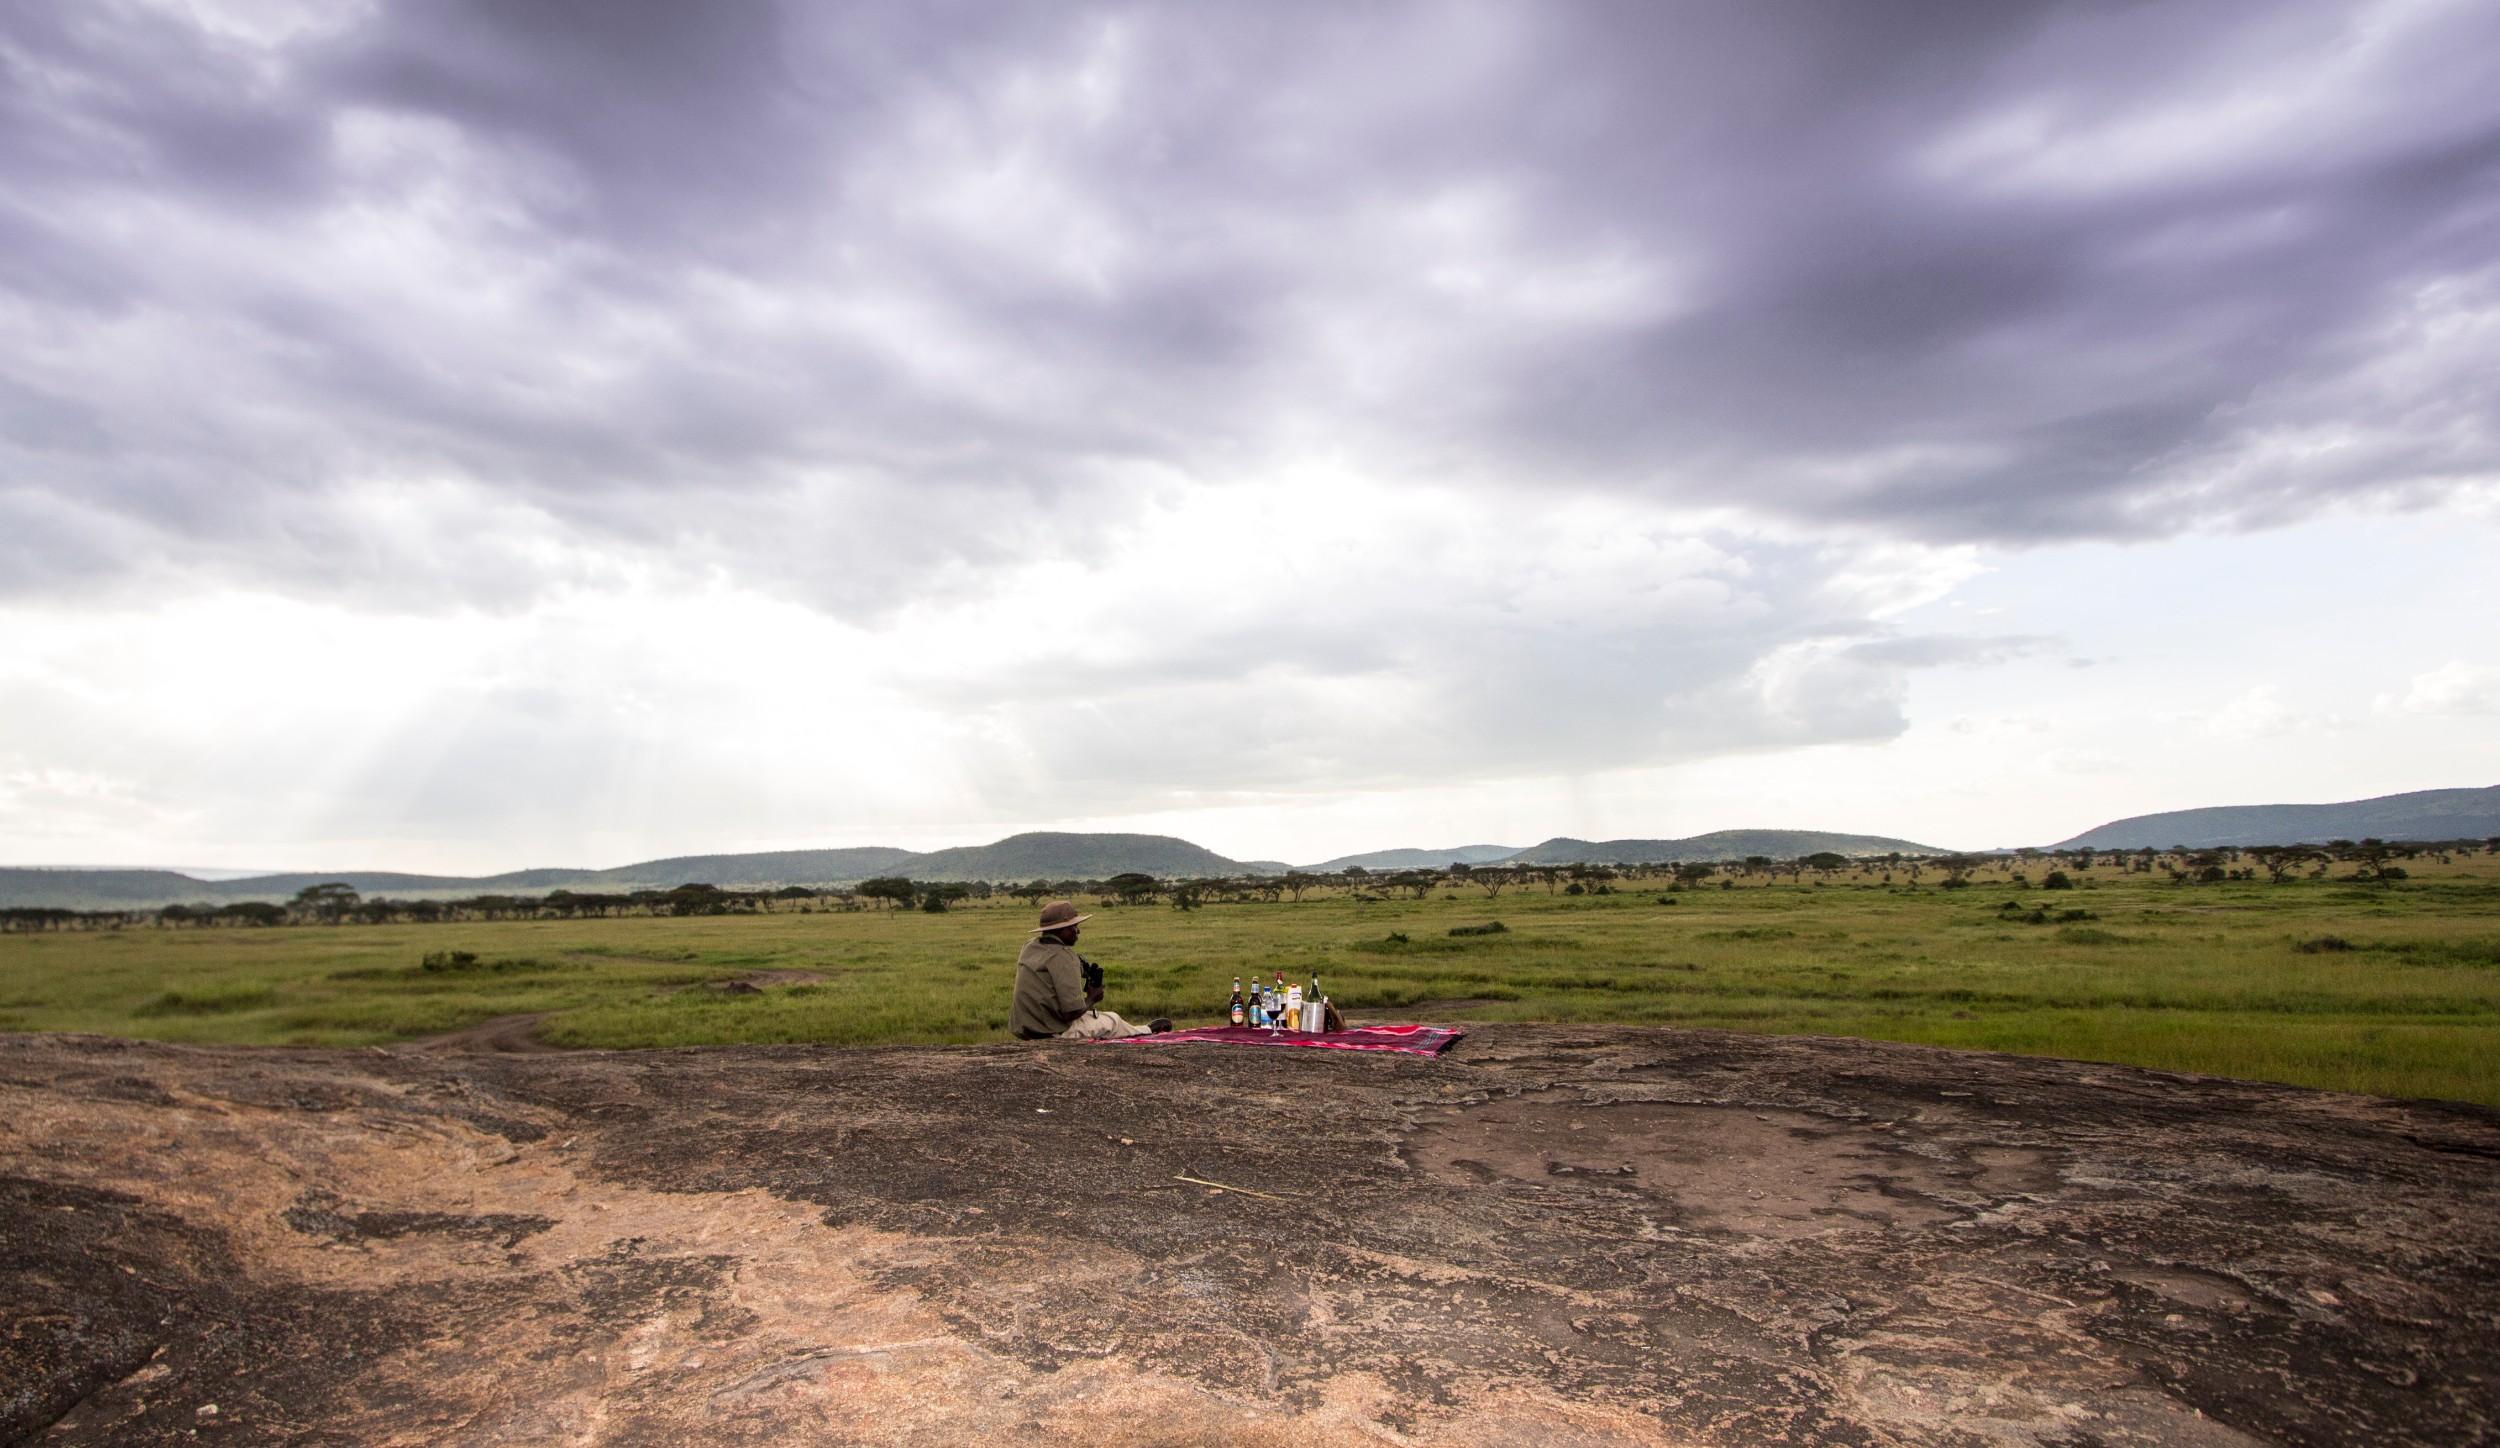 Dunia-Camp-bush-picnic-Tracey-Van-Wijk-HR.jpg